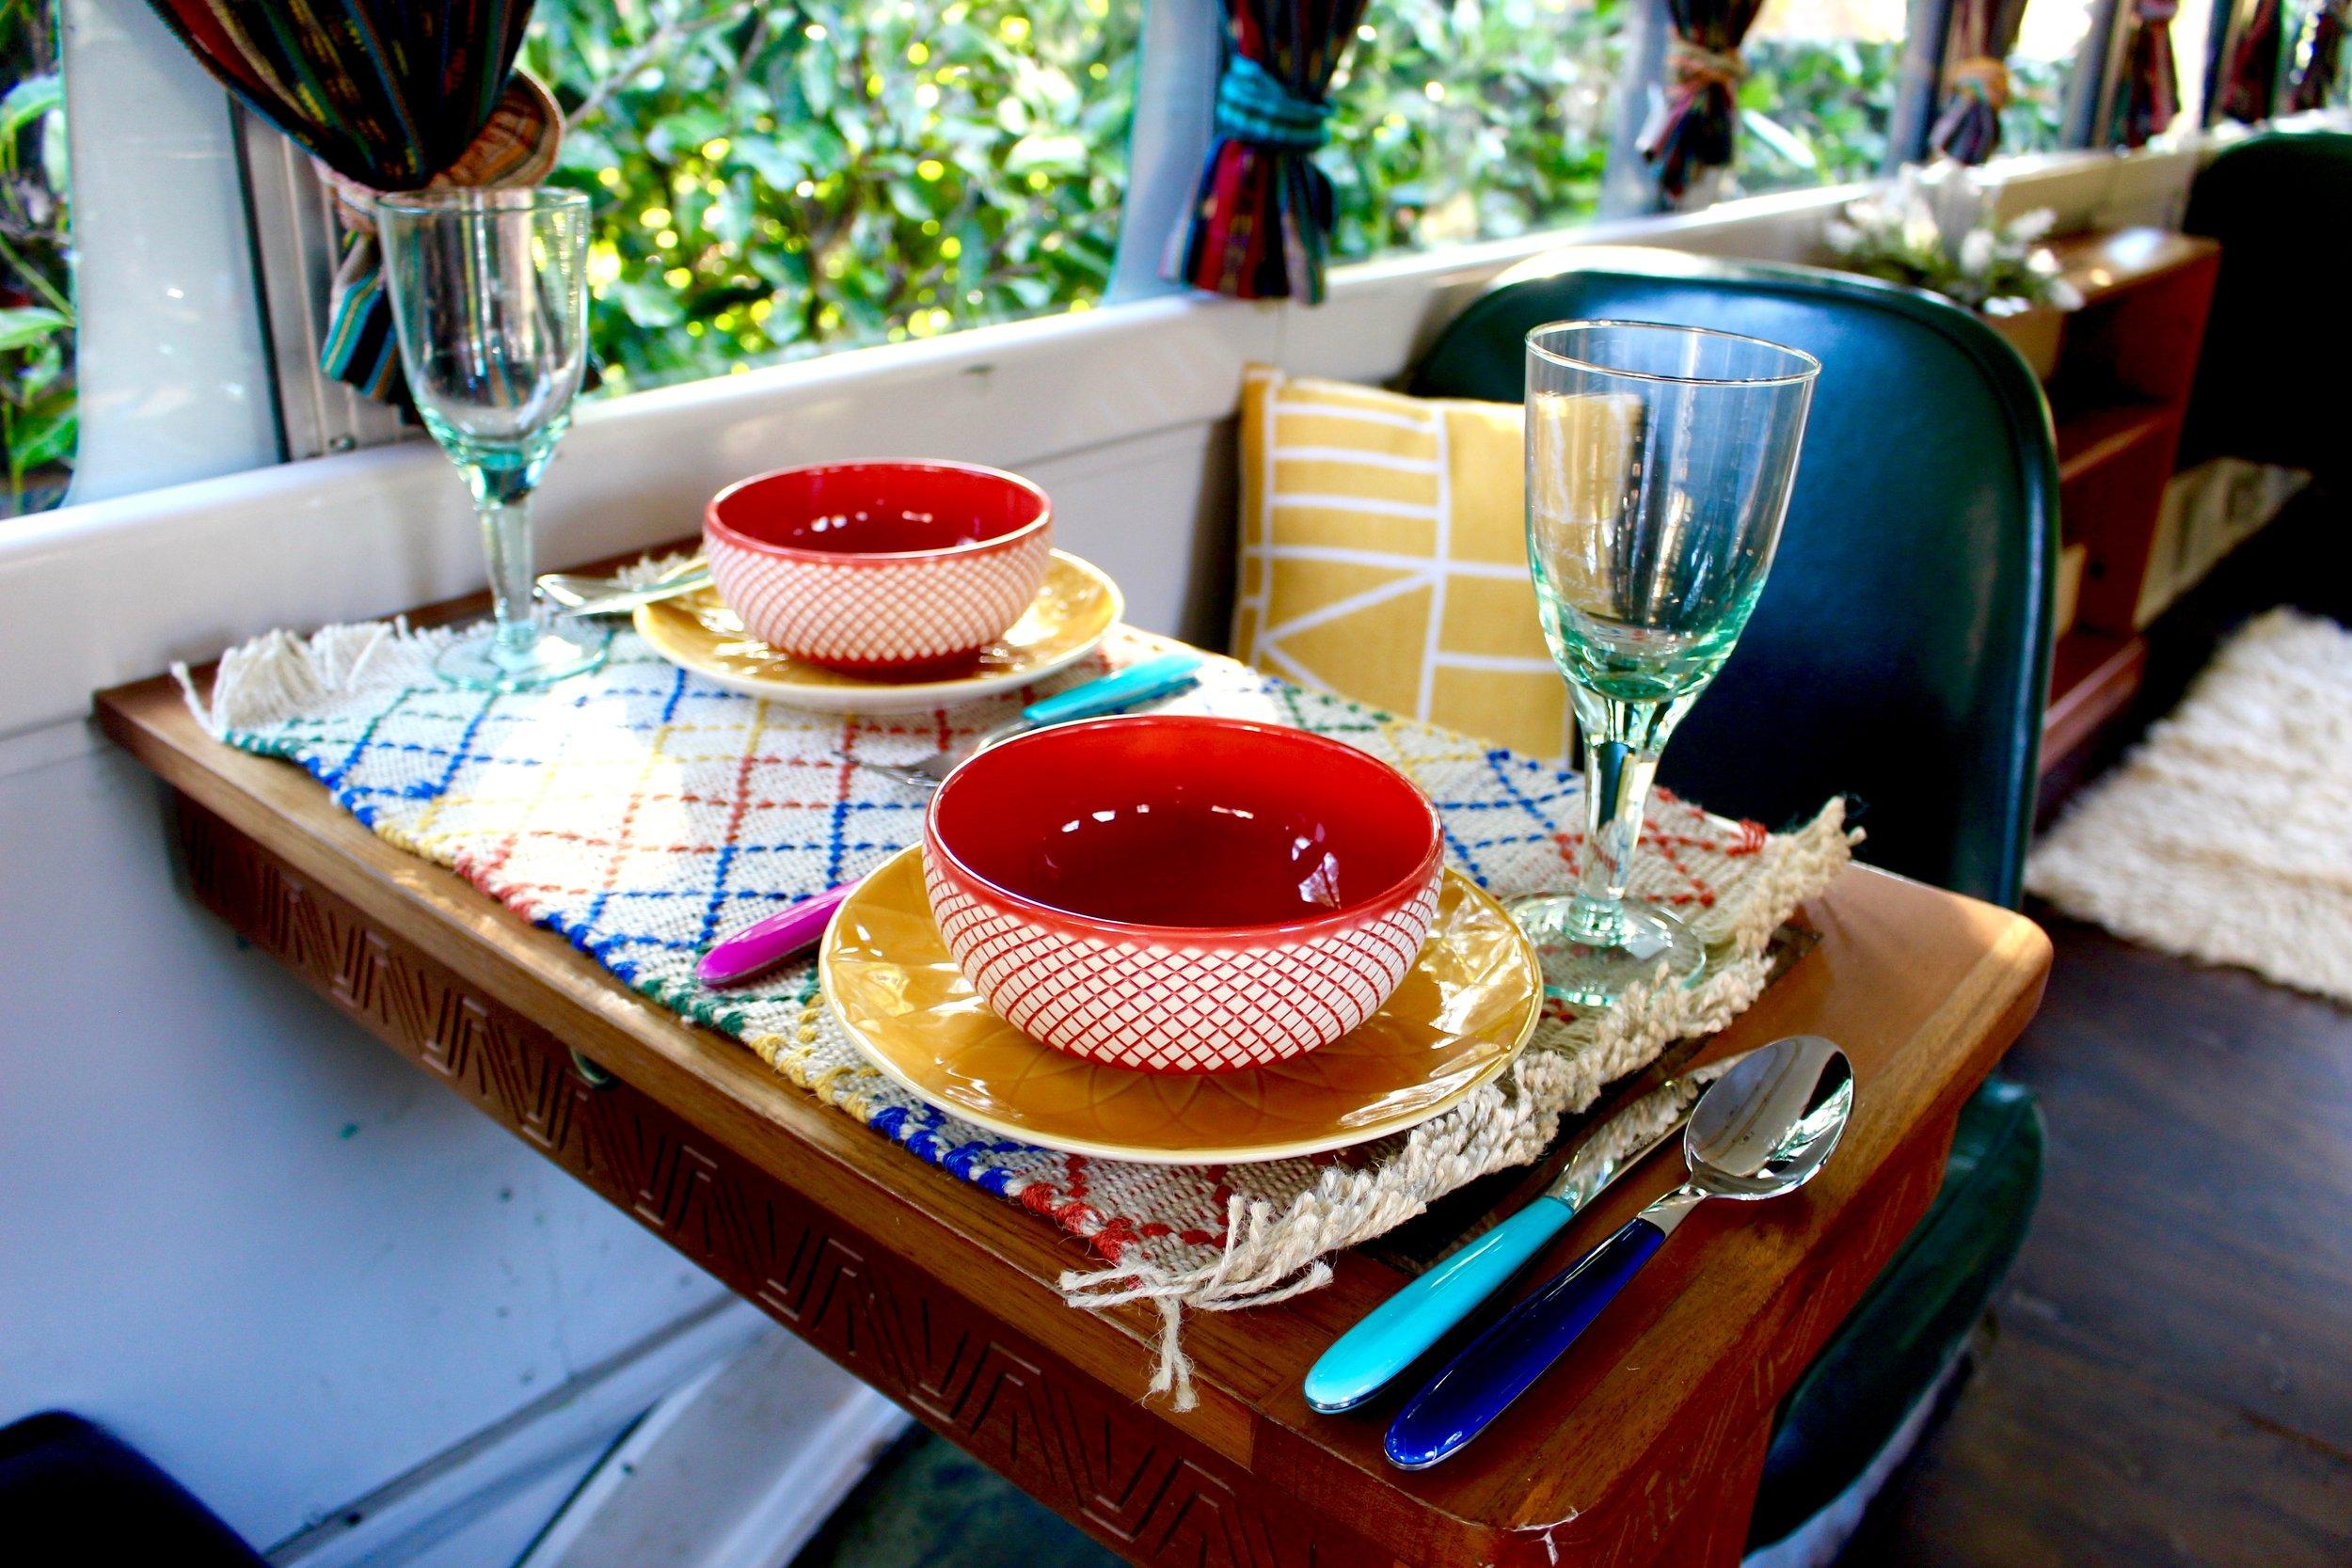 Colourful_table-setting.jpg